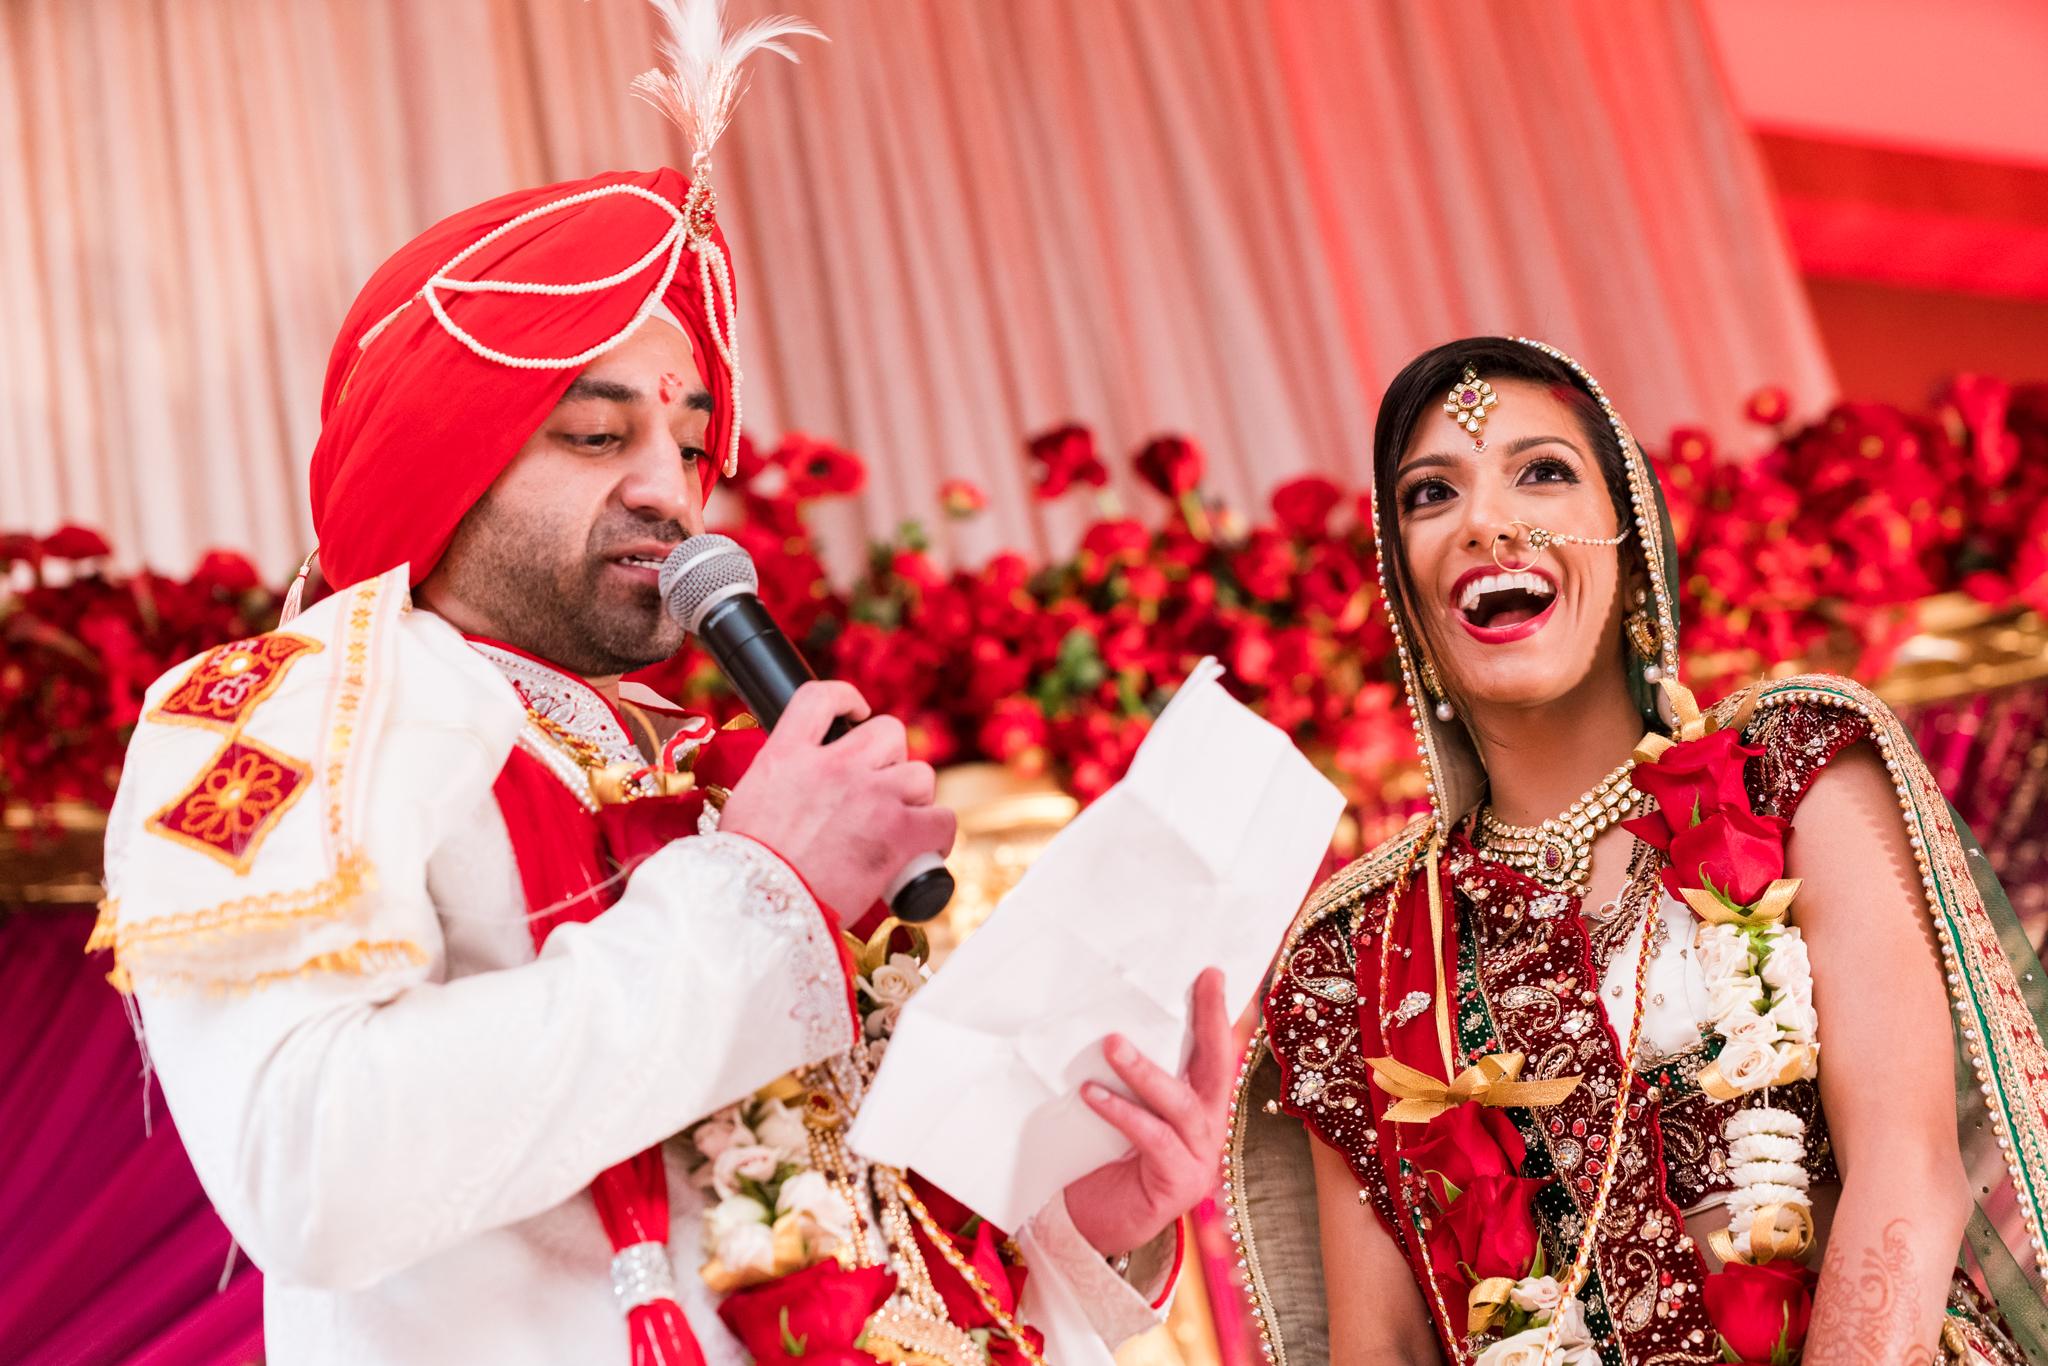 ReeyaAman-Wedding-Photography-www.MnMfoto.comMnMfoto-Krishna-Sajan-1179.jpg